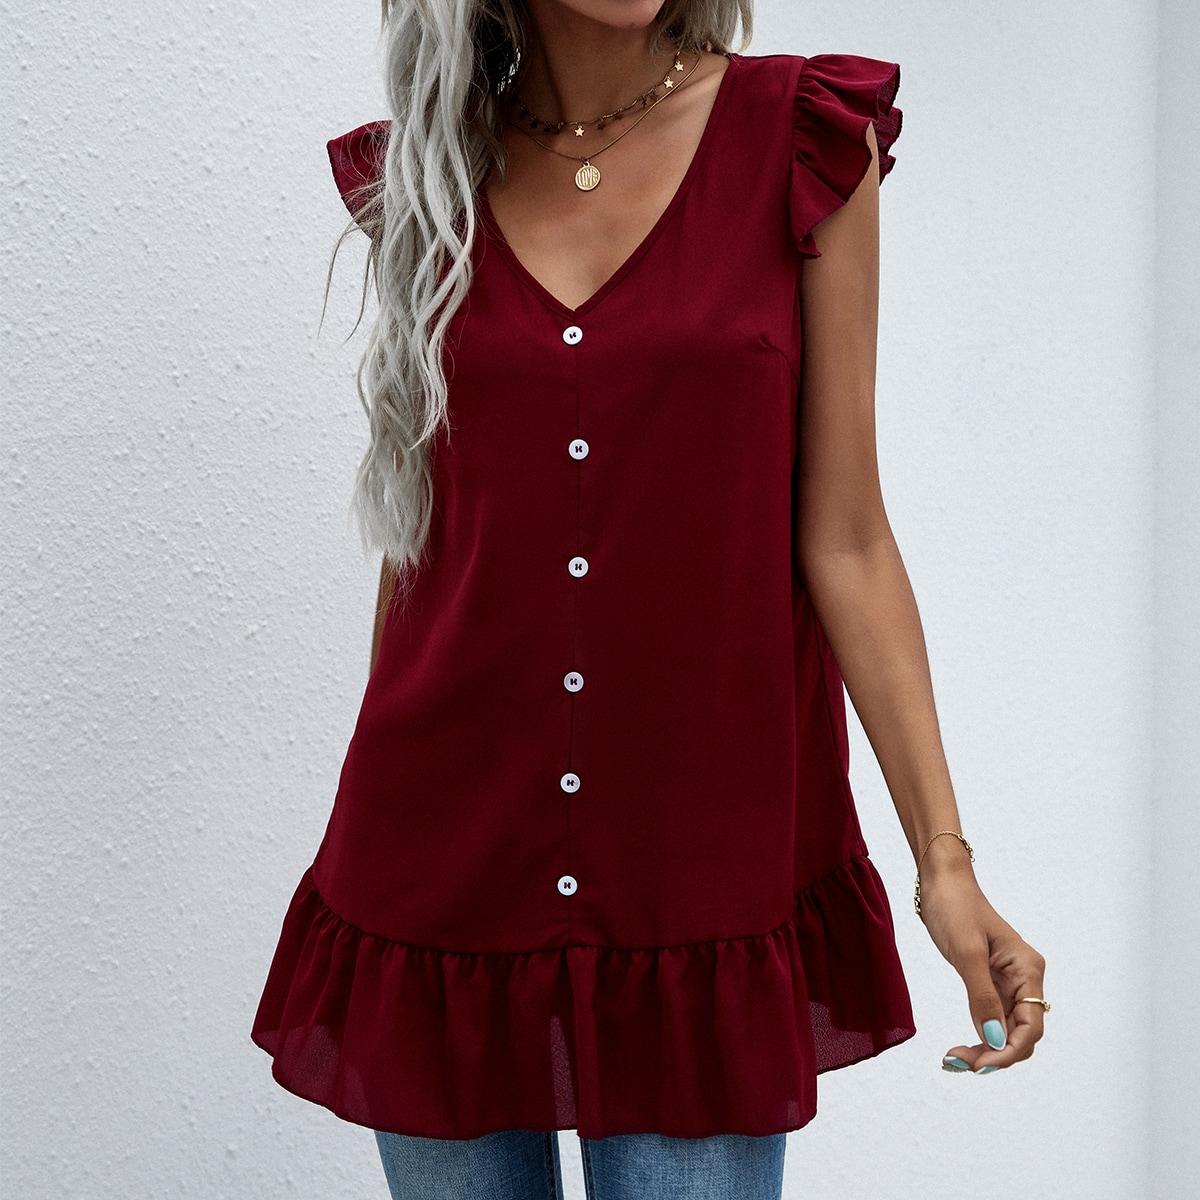 Блуза на пуговицах с оборками SheIn swblouse23210322187